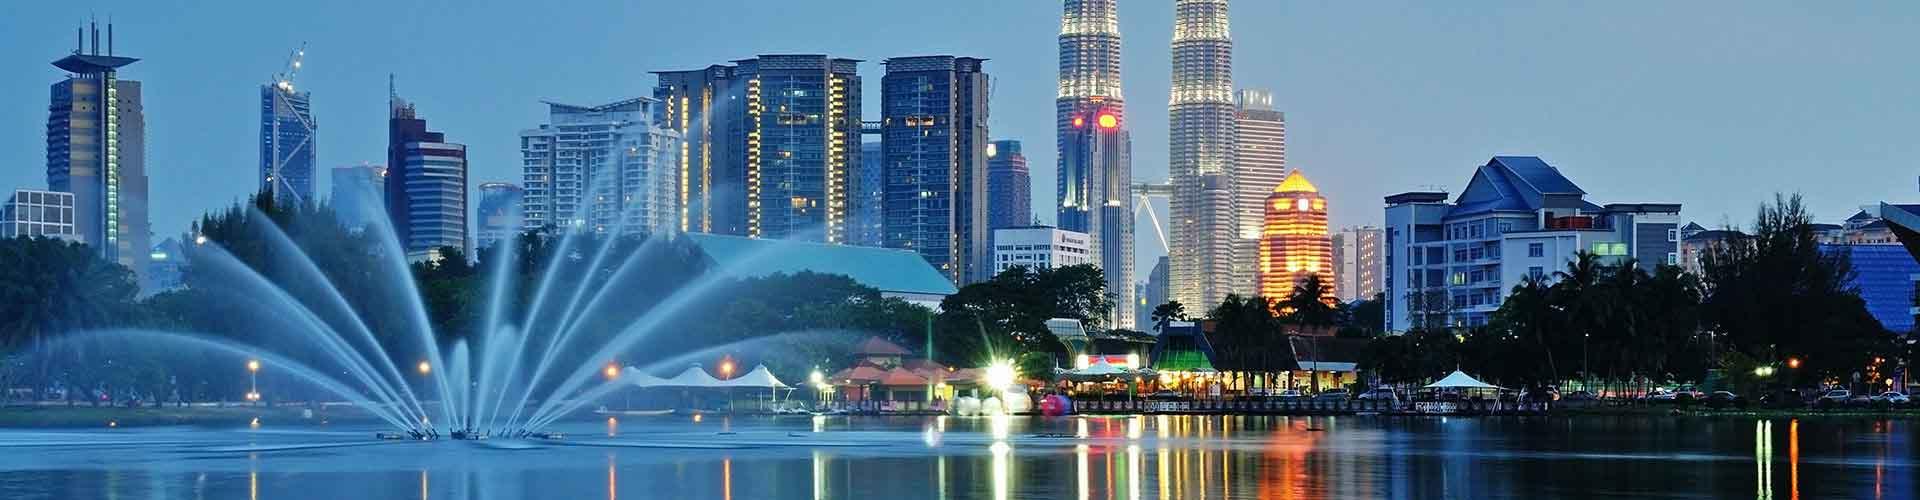 Kuala Lumpur - Habitaciones en el distrito Taman Sungai Besi. Mapas de Kuala Lumpur, Fotos y comentarios de cada Habitación en Kuala Lumpur.